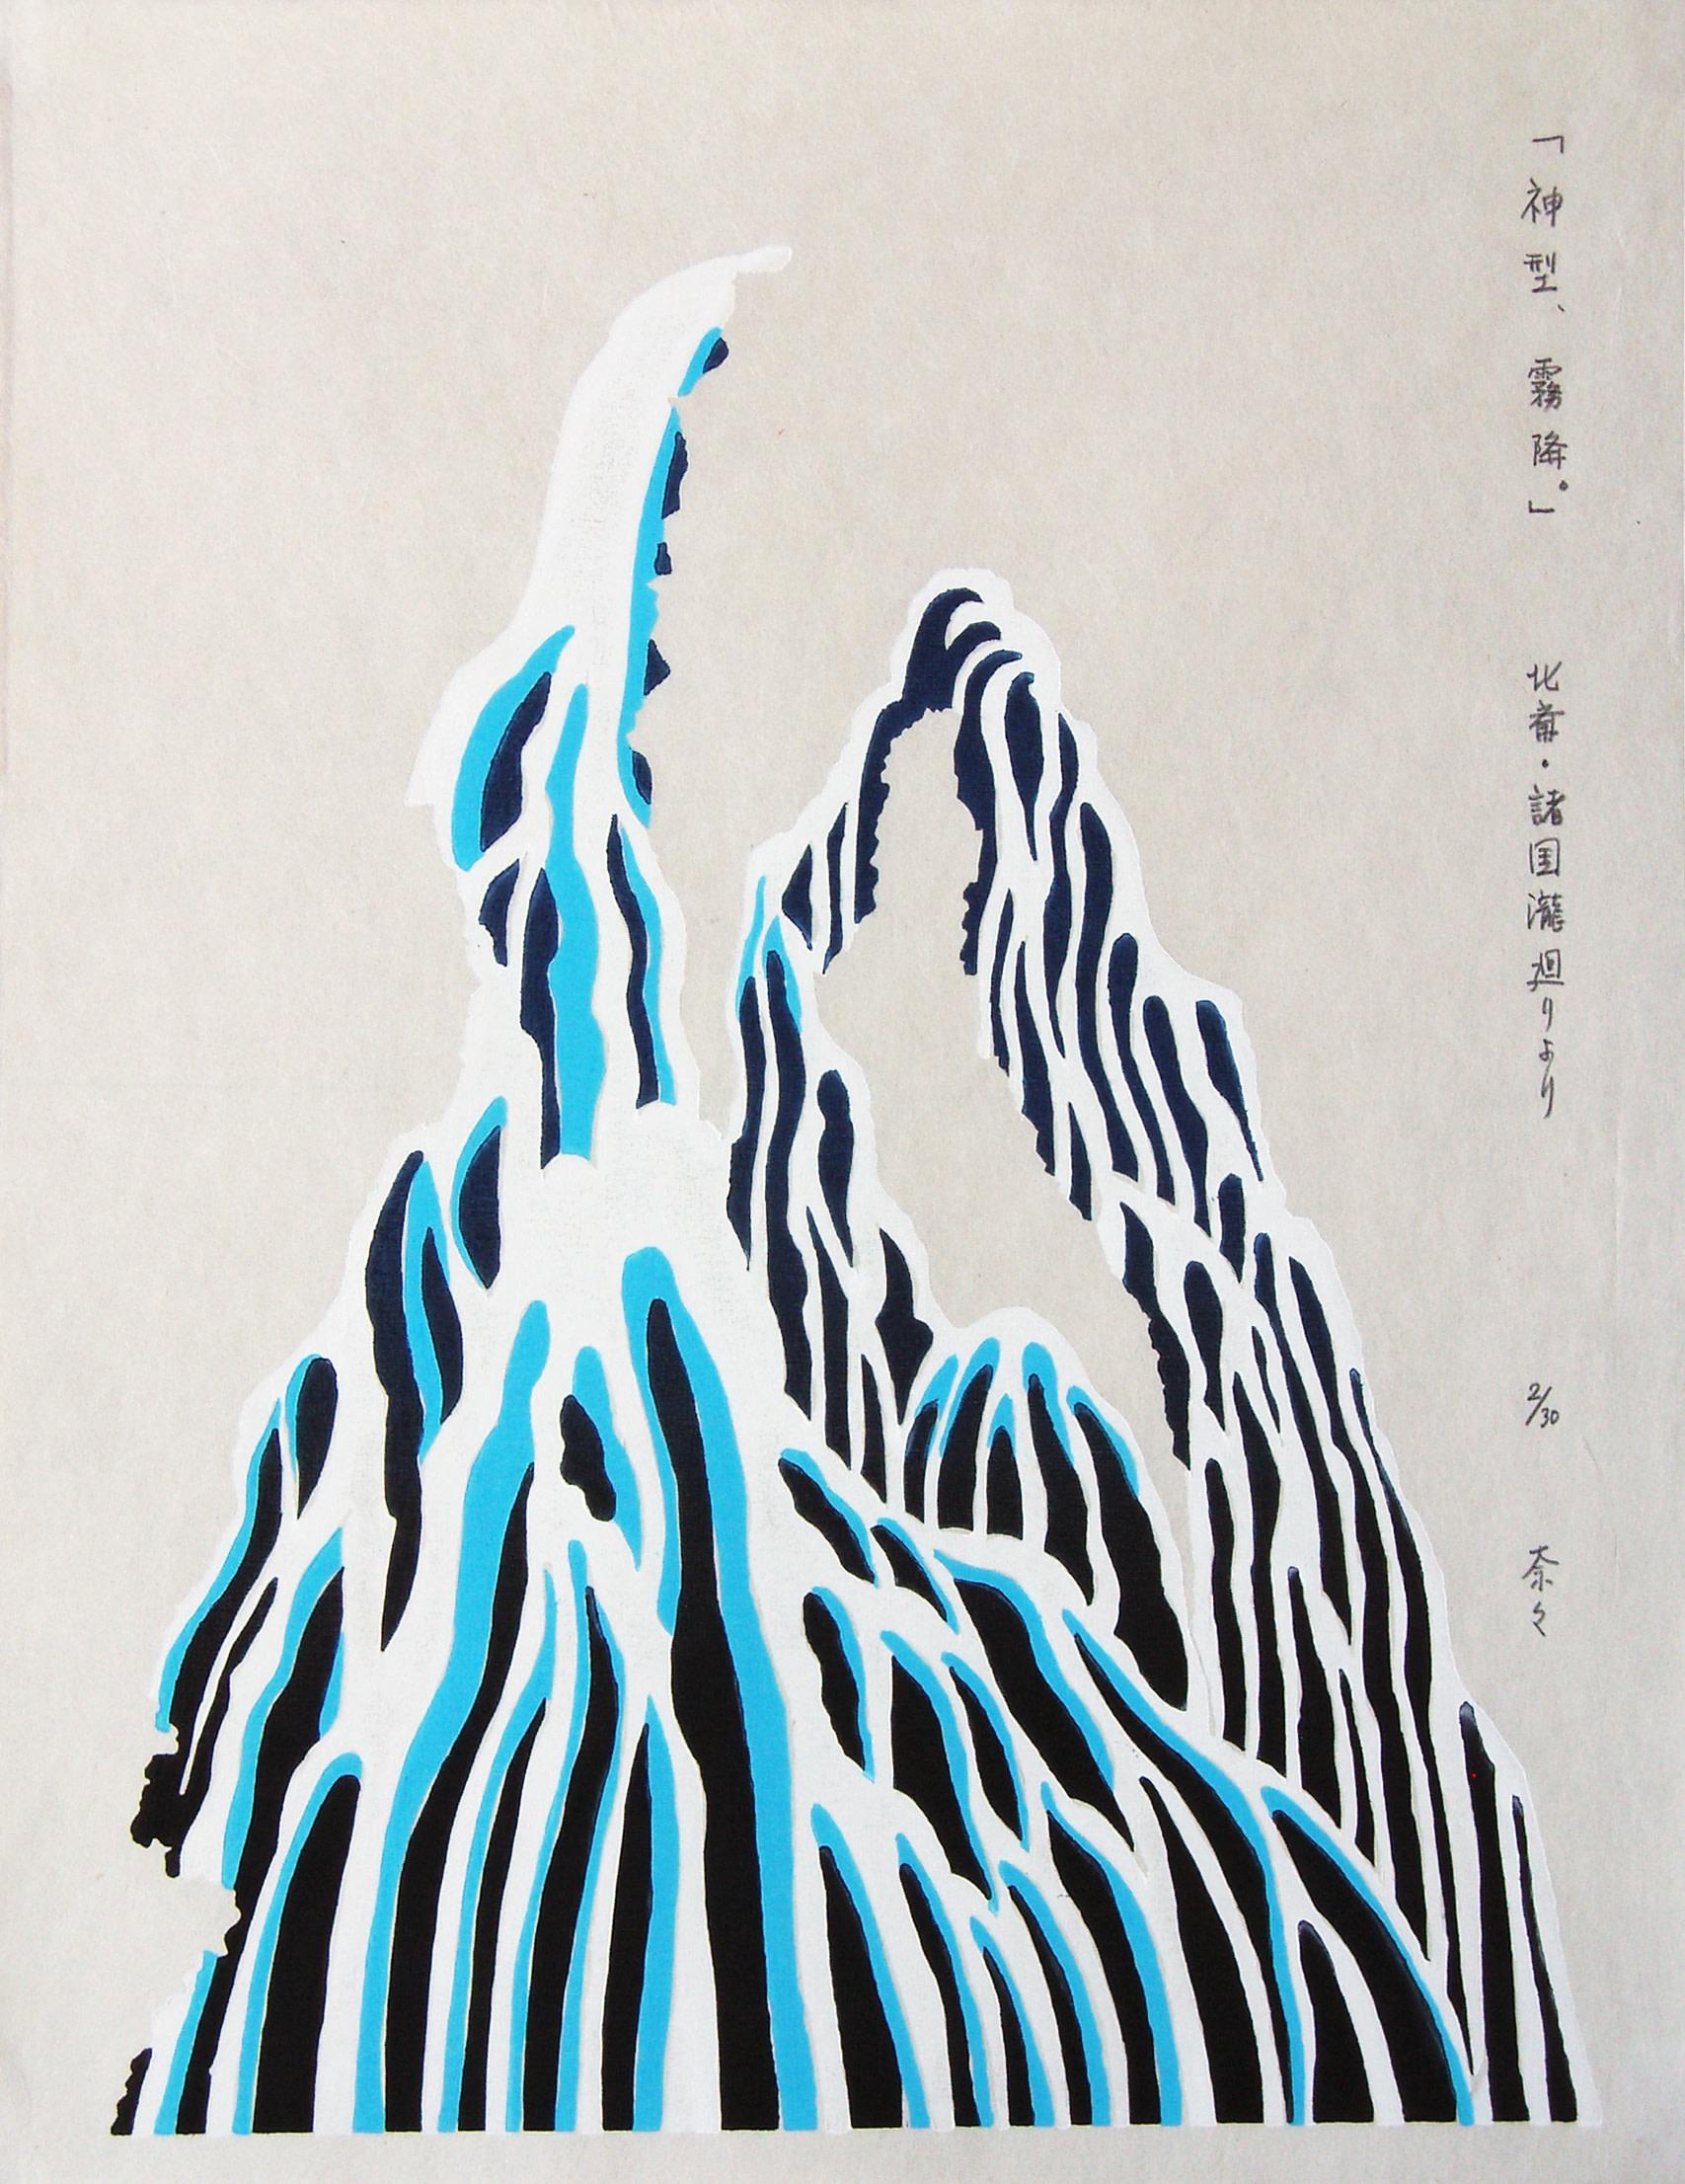 "<span class=""link fancybox-details-link""><a href=""/exhibitions/21/works/artworks_standalone10888/"">View Detail Page</a></span><div class=""artist""><span class=""artist""><strong>Nana Shiomi RE</strong></span></div><div class=""title""><em>Shape of God, Kirifuri from Hokusai</em></div><div class=""medium"">woodcut</div><div class=""dimensions"">70 x 57cm framed<br>64 x 50cm unframed</div><div class=""edition_details"">edition of 30</div>"